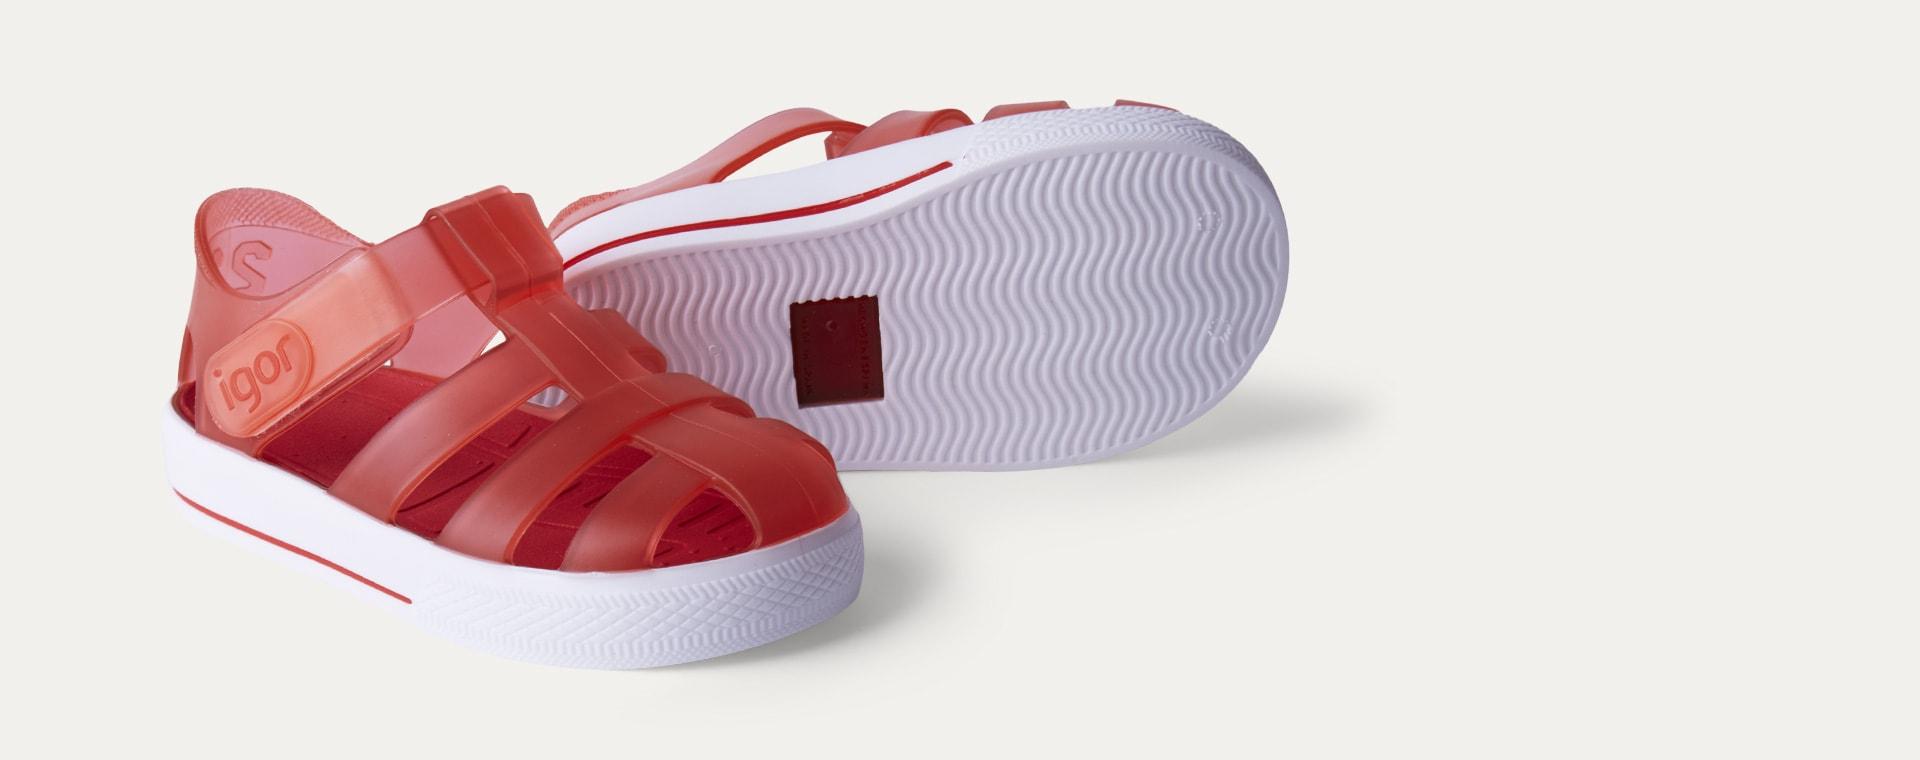 Rojo igor Star Velcro Jelly shoes